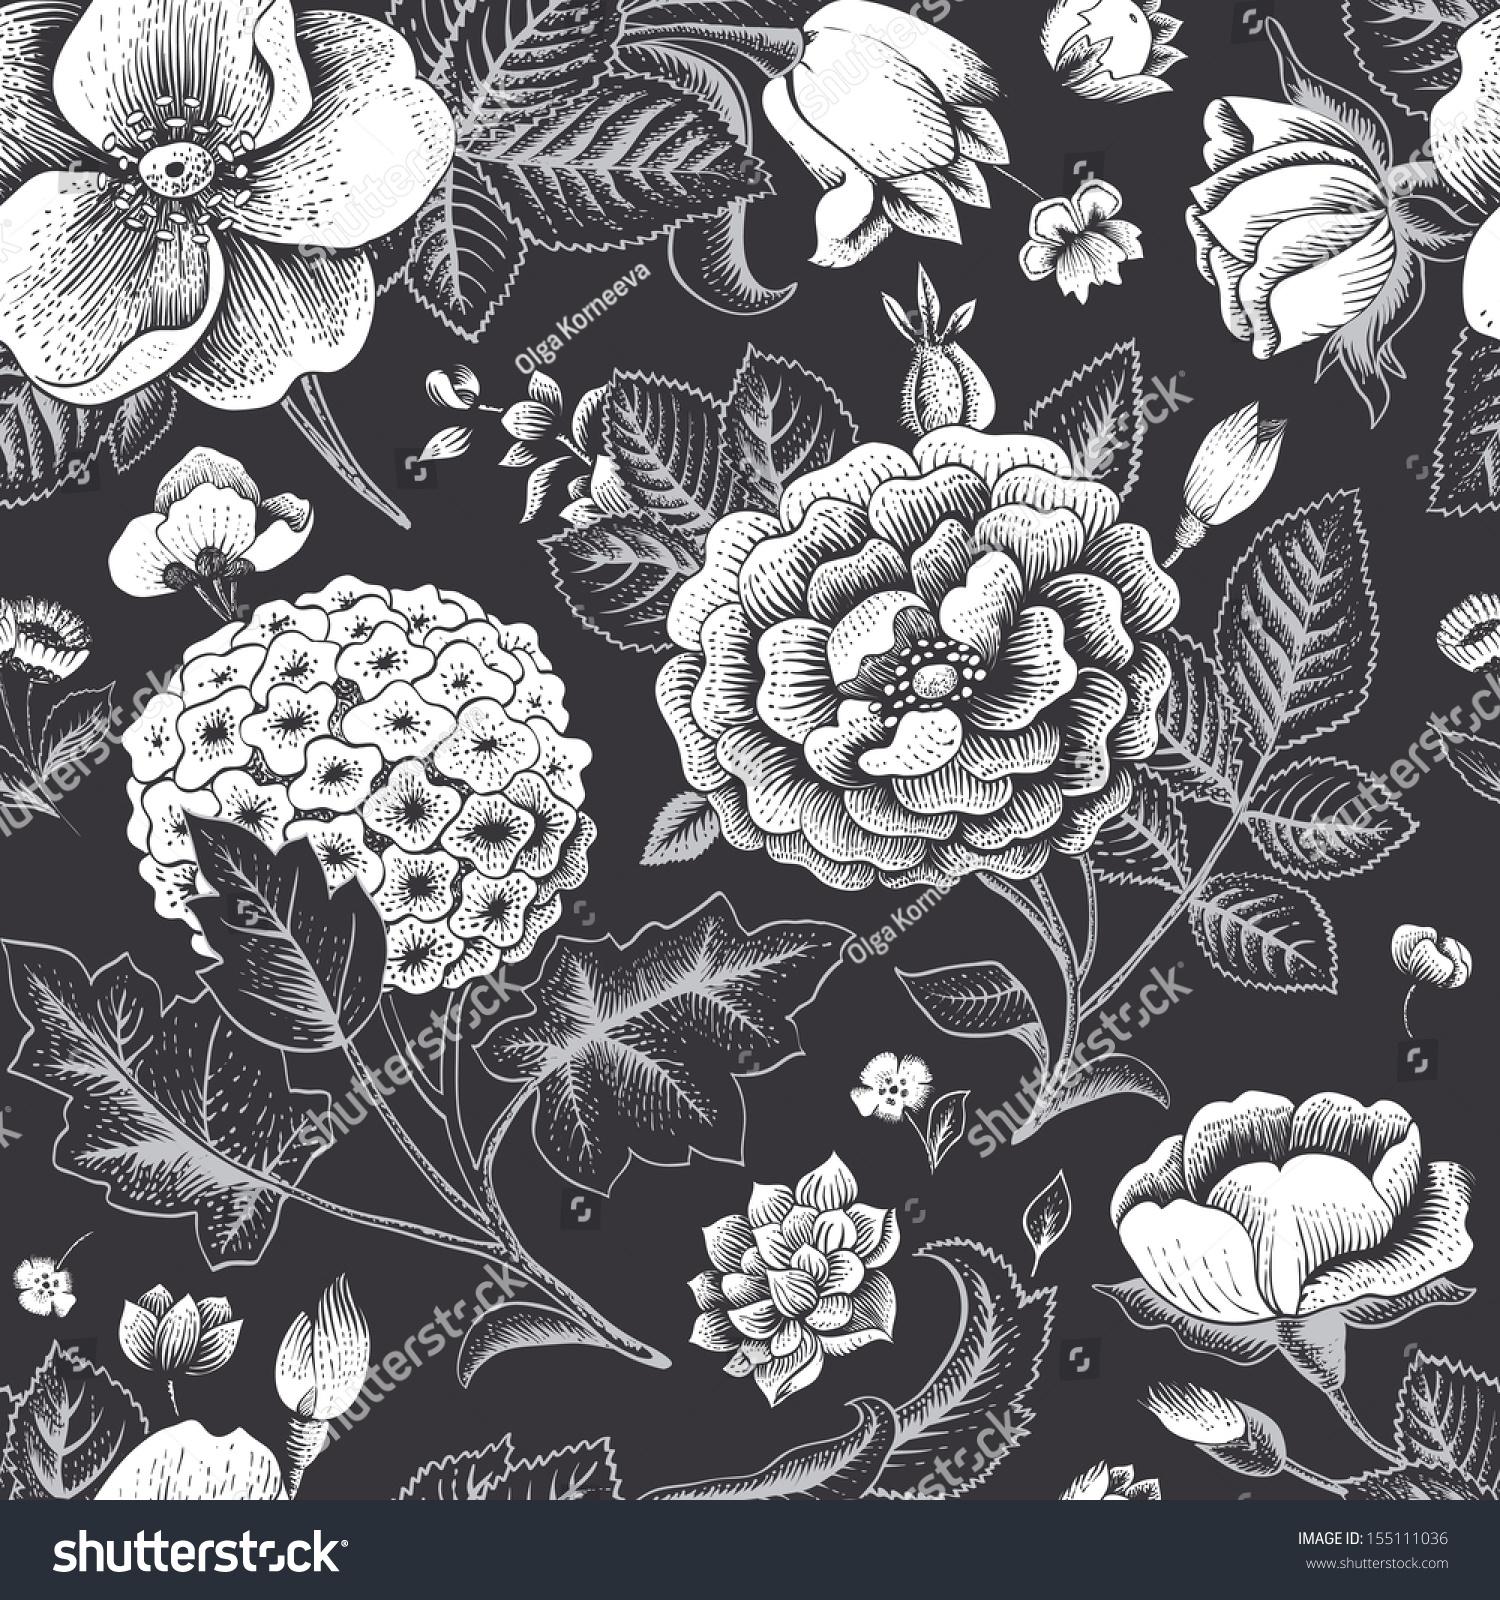 vintage patterns black and white japanese - Google Search ...   Black Floral Vintage Pattern